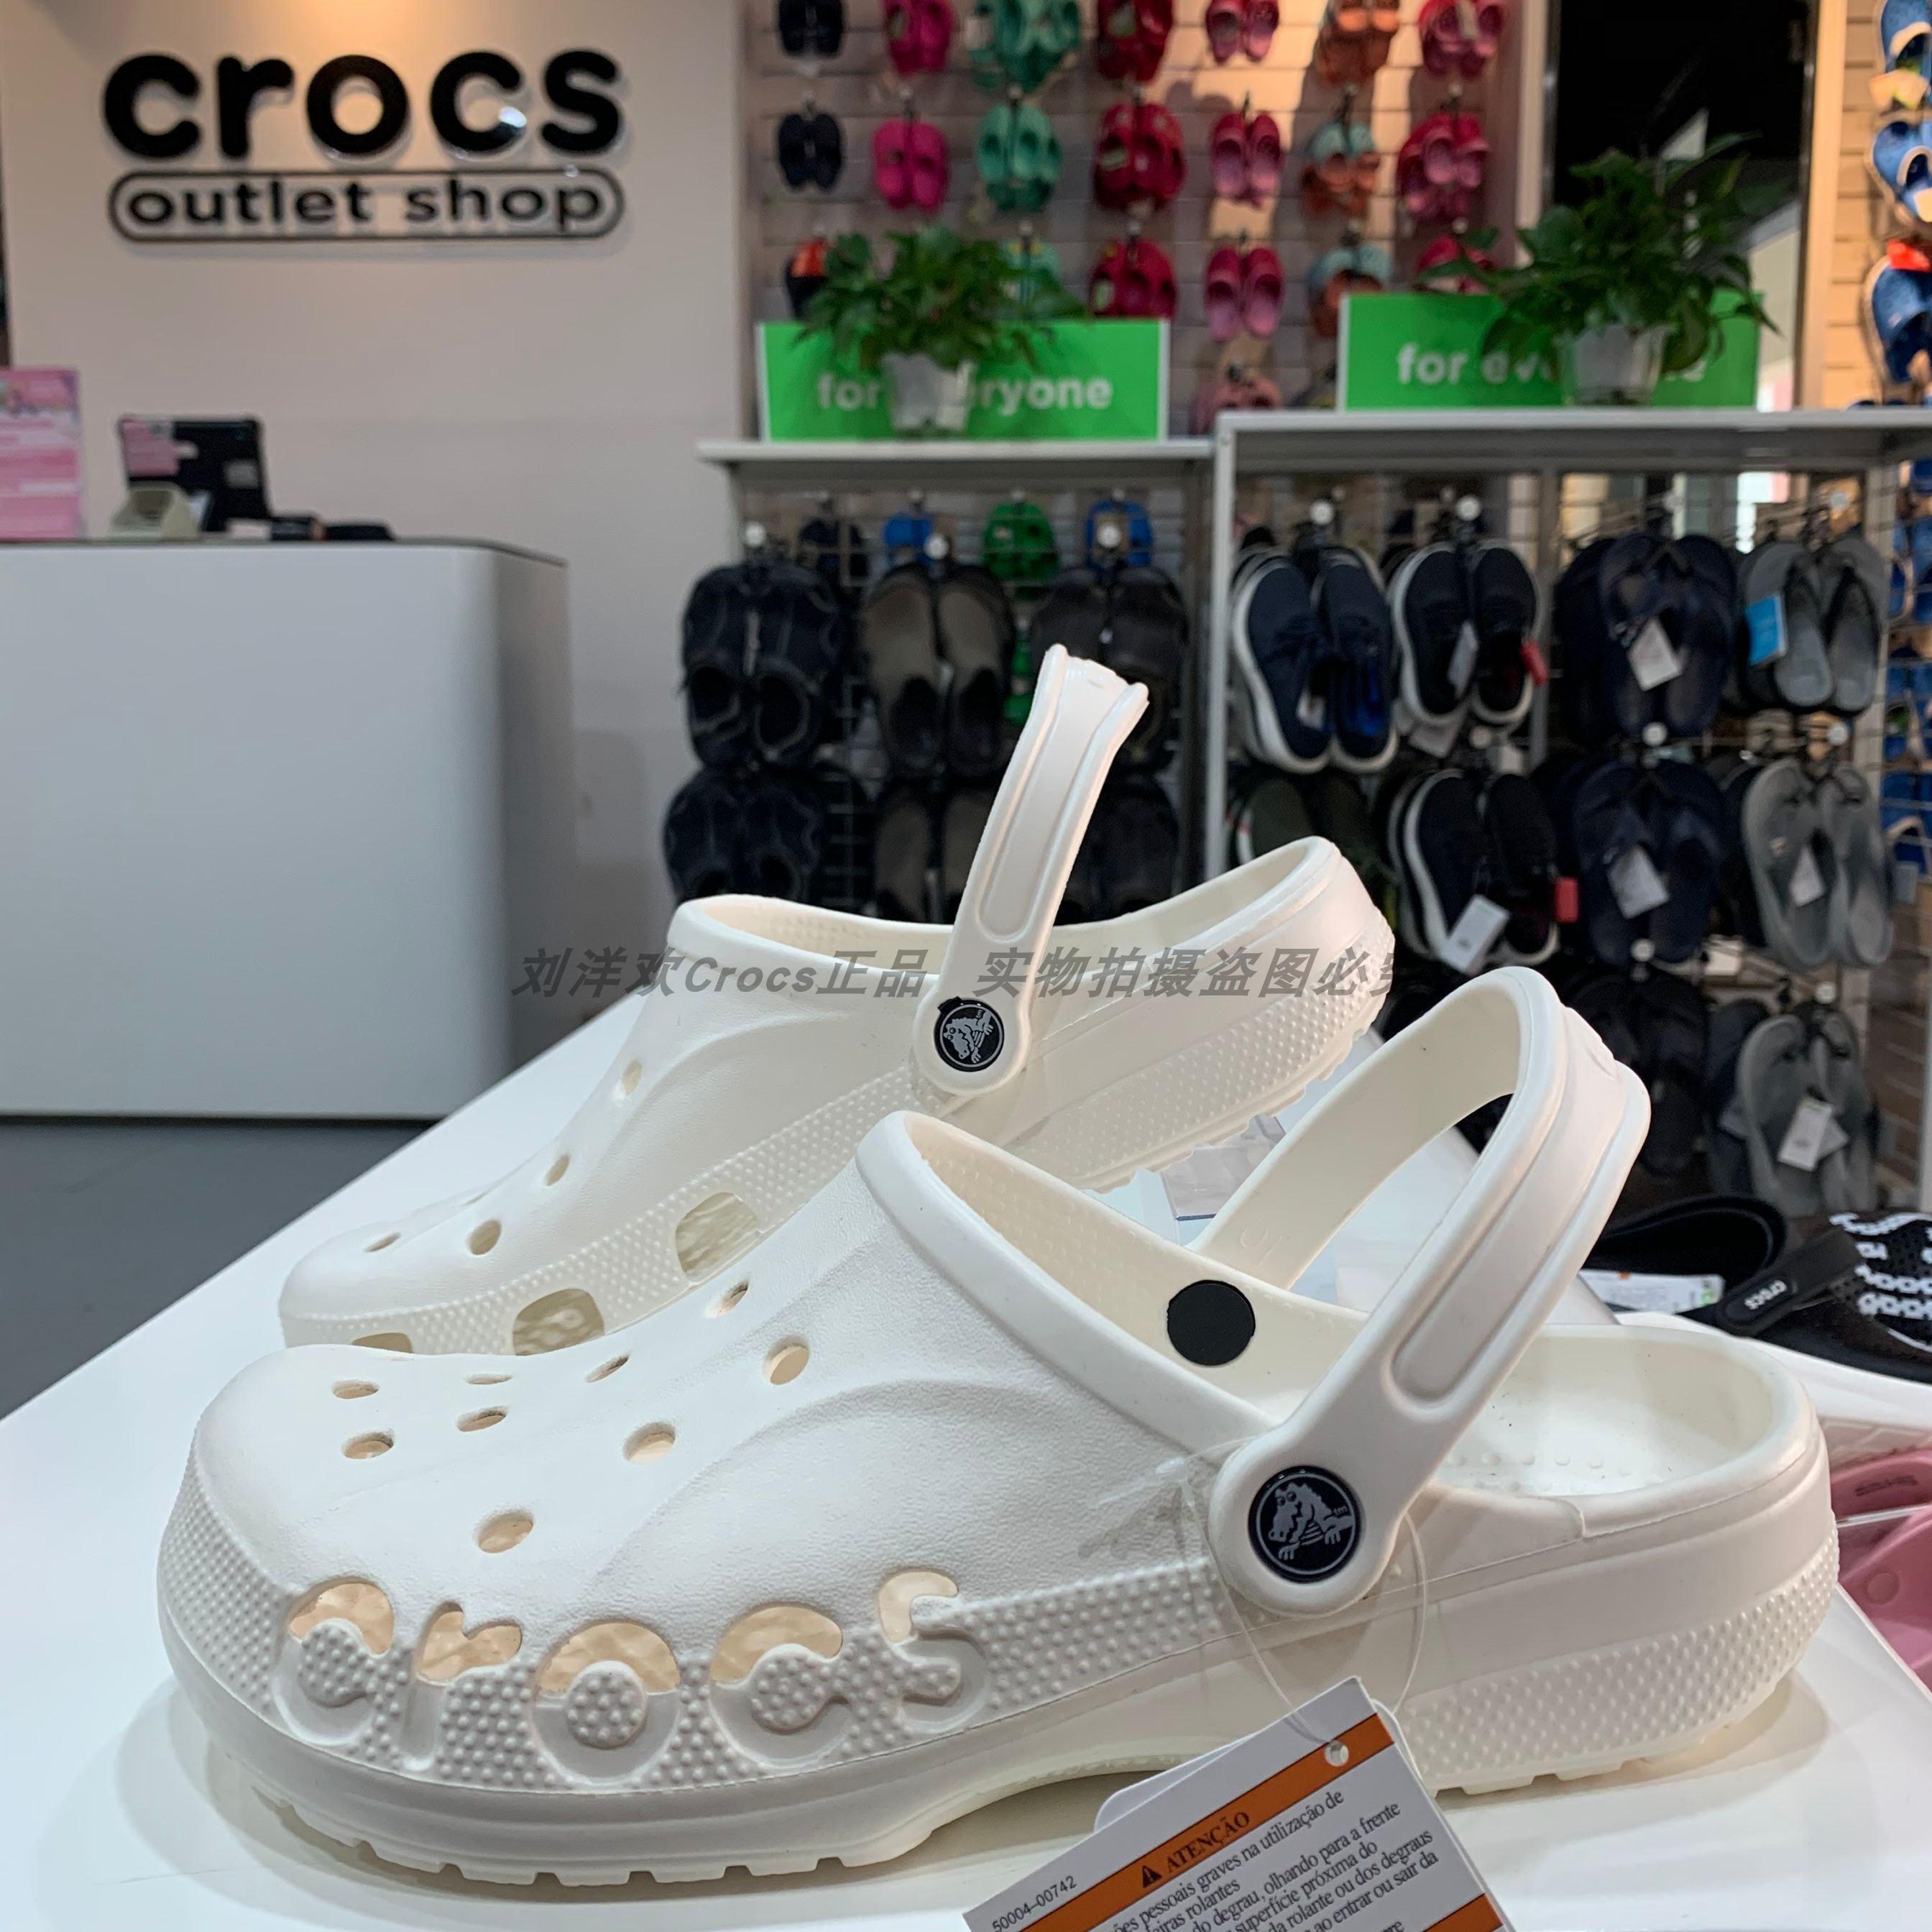 Crocs洞洞鞋 男鞋防滑凉鞋 女鞋小白鞋休闲 防滑拖鞋沙滩鞋|10126